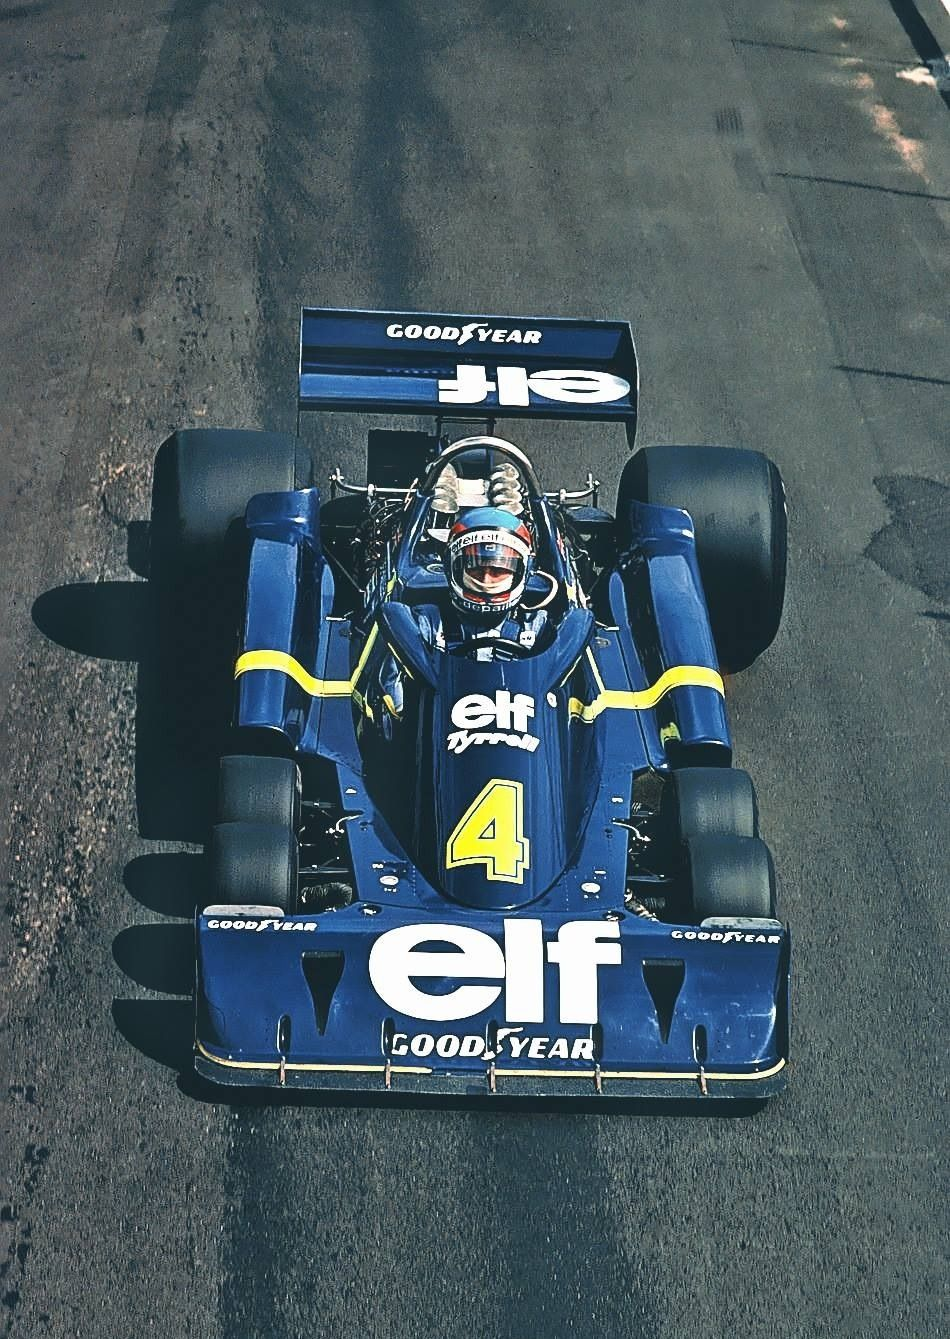 tyrrell p34 1977 british grand prix 6 wheels motor 4 pinterest wheels f1 and grand prix. Black Bedroom Furniture Sets. Home Design Ideas